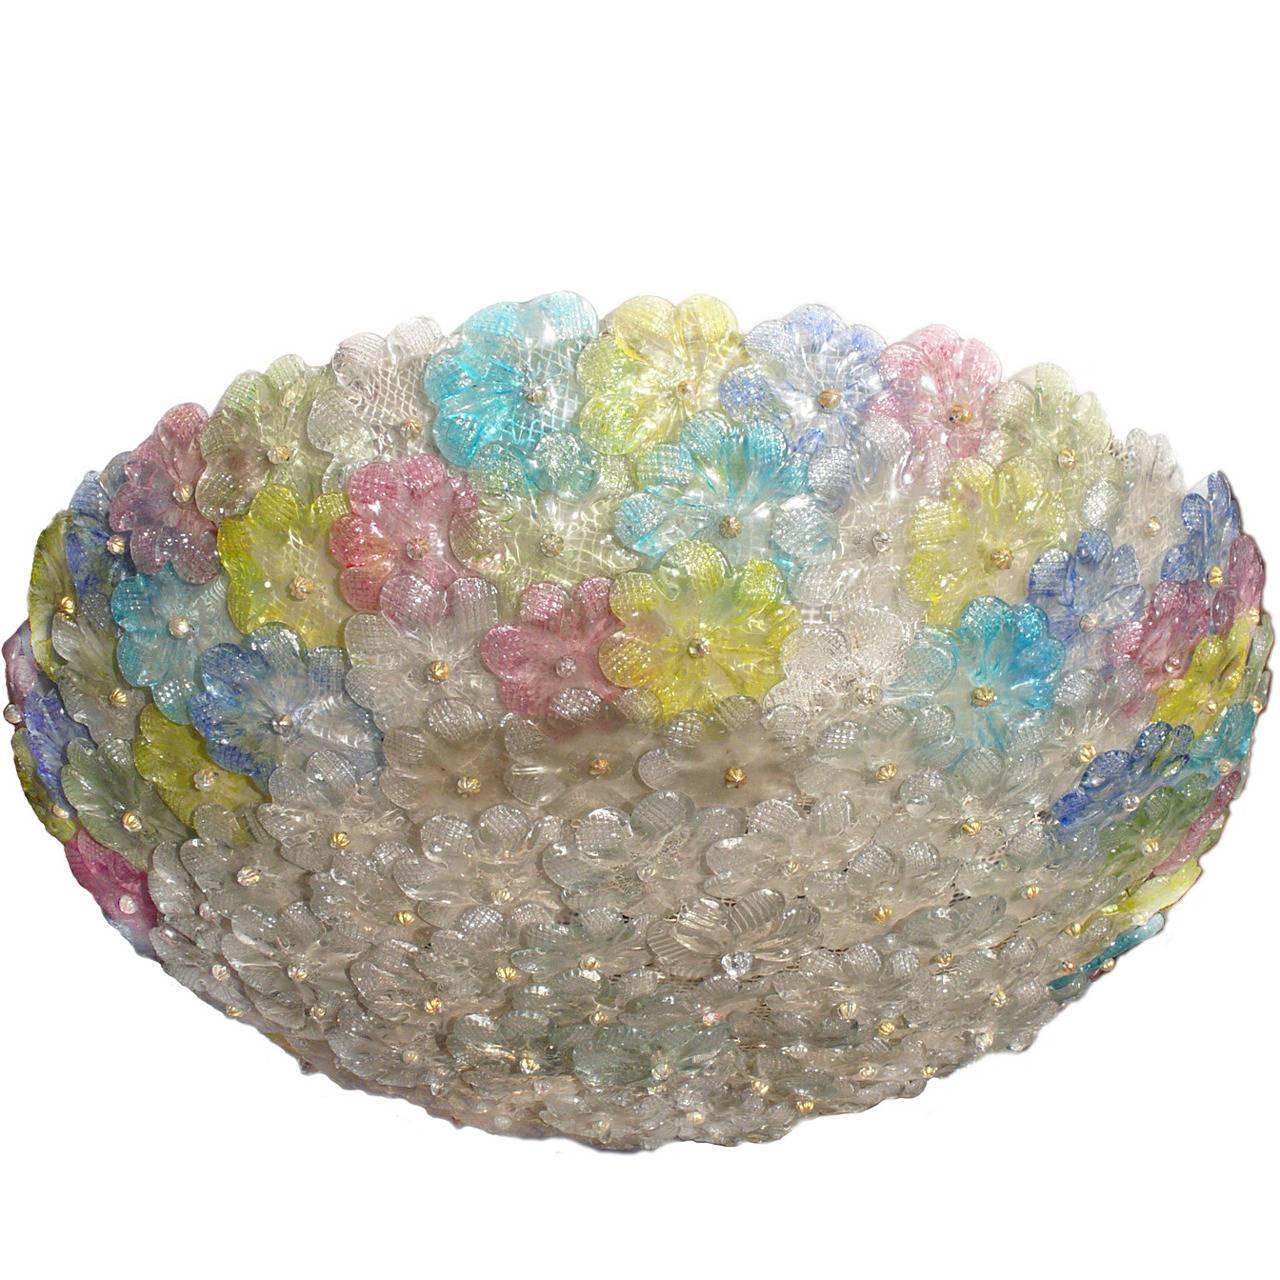 Barovier & Toso Multi-Color Murano Flower Glass Ceiling Light, 1950s